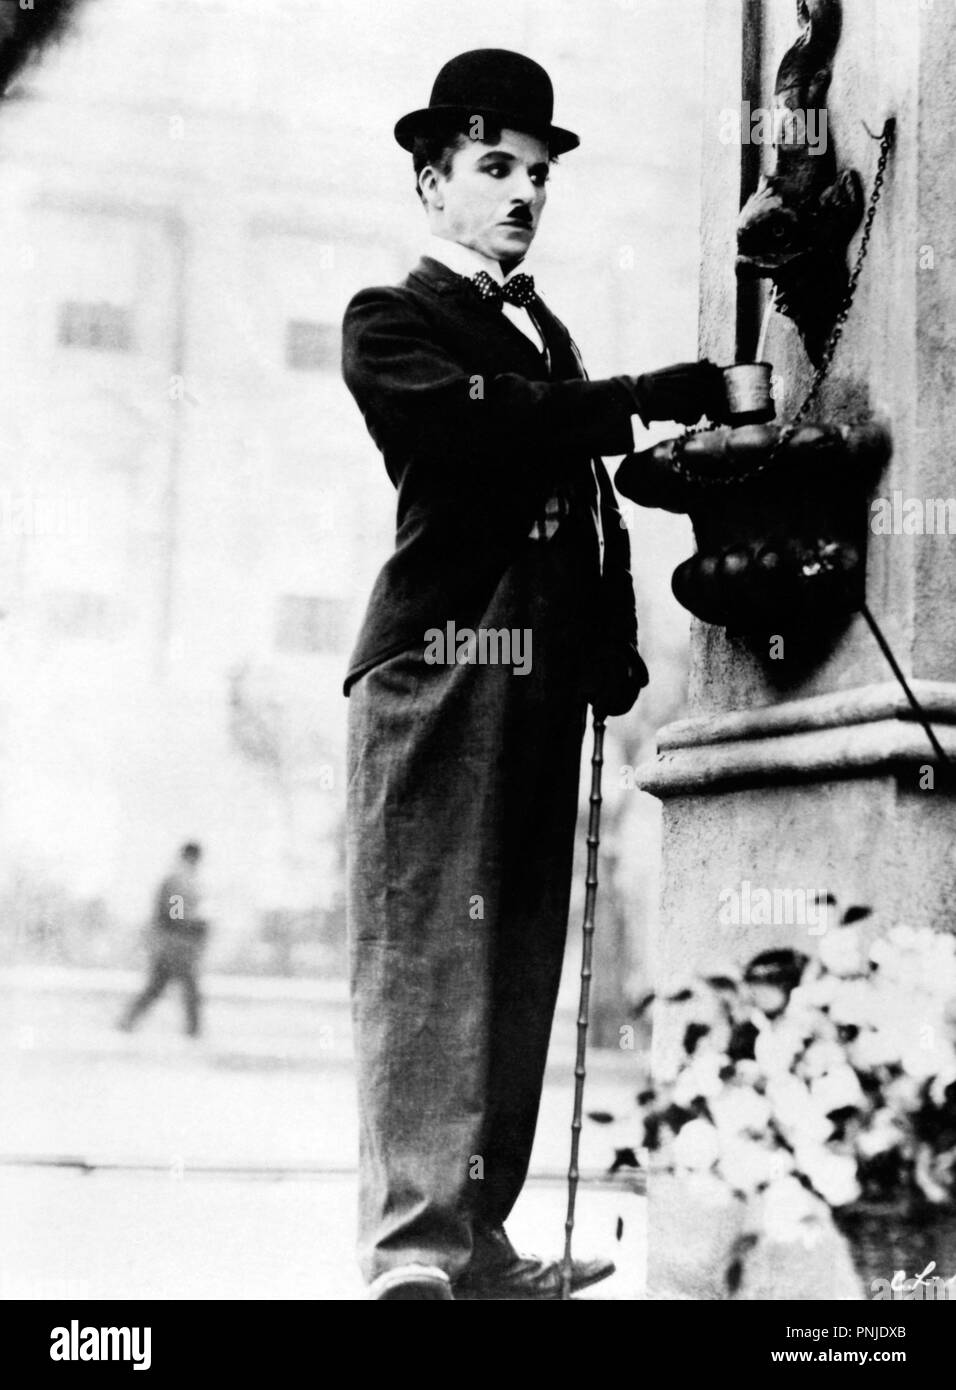 Original film title: CITY LIGHTS. English title: CITY LIGHTS. Year: 1931. Director: CHARLIE CHAPLIN. Stars: CHARLIE CHAPLIN. Credit: UNITED ARTISTS / Album - Stock Image